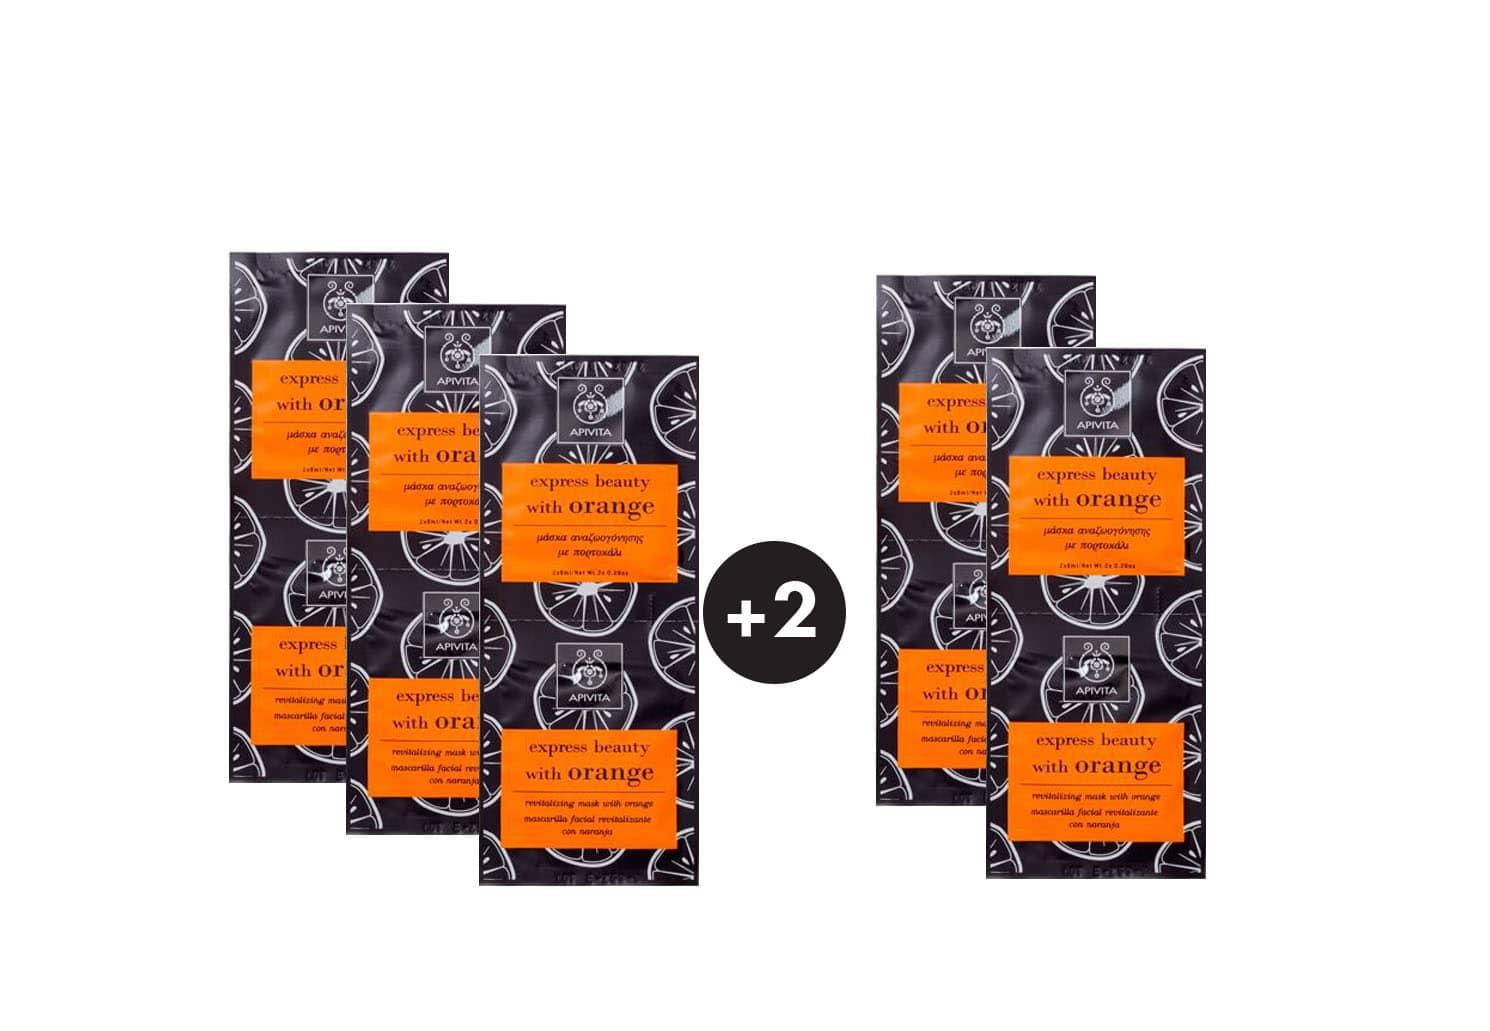 5 x Apivita Express Beauty Μάσκα Περιποίησης & Αναζωογόνησης Προσώπου για Λάμψη με Πορτοκάλι (3+2 ΔΩΡΟ),10 x 8ml